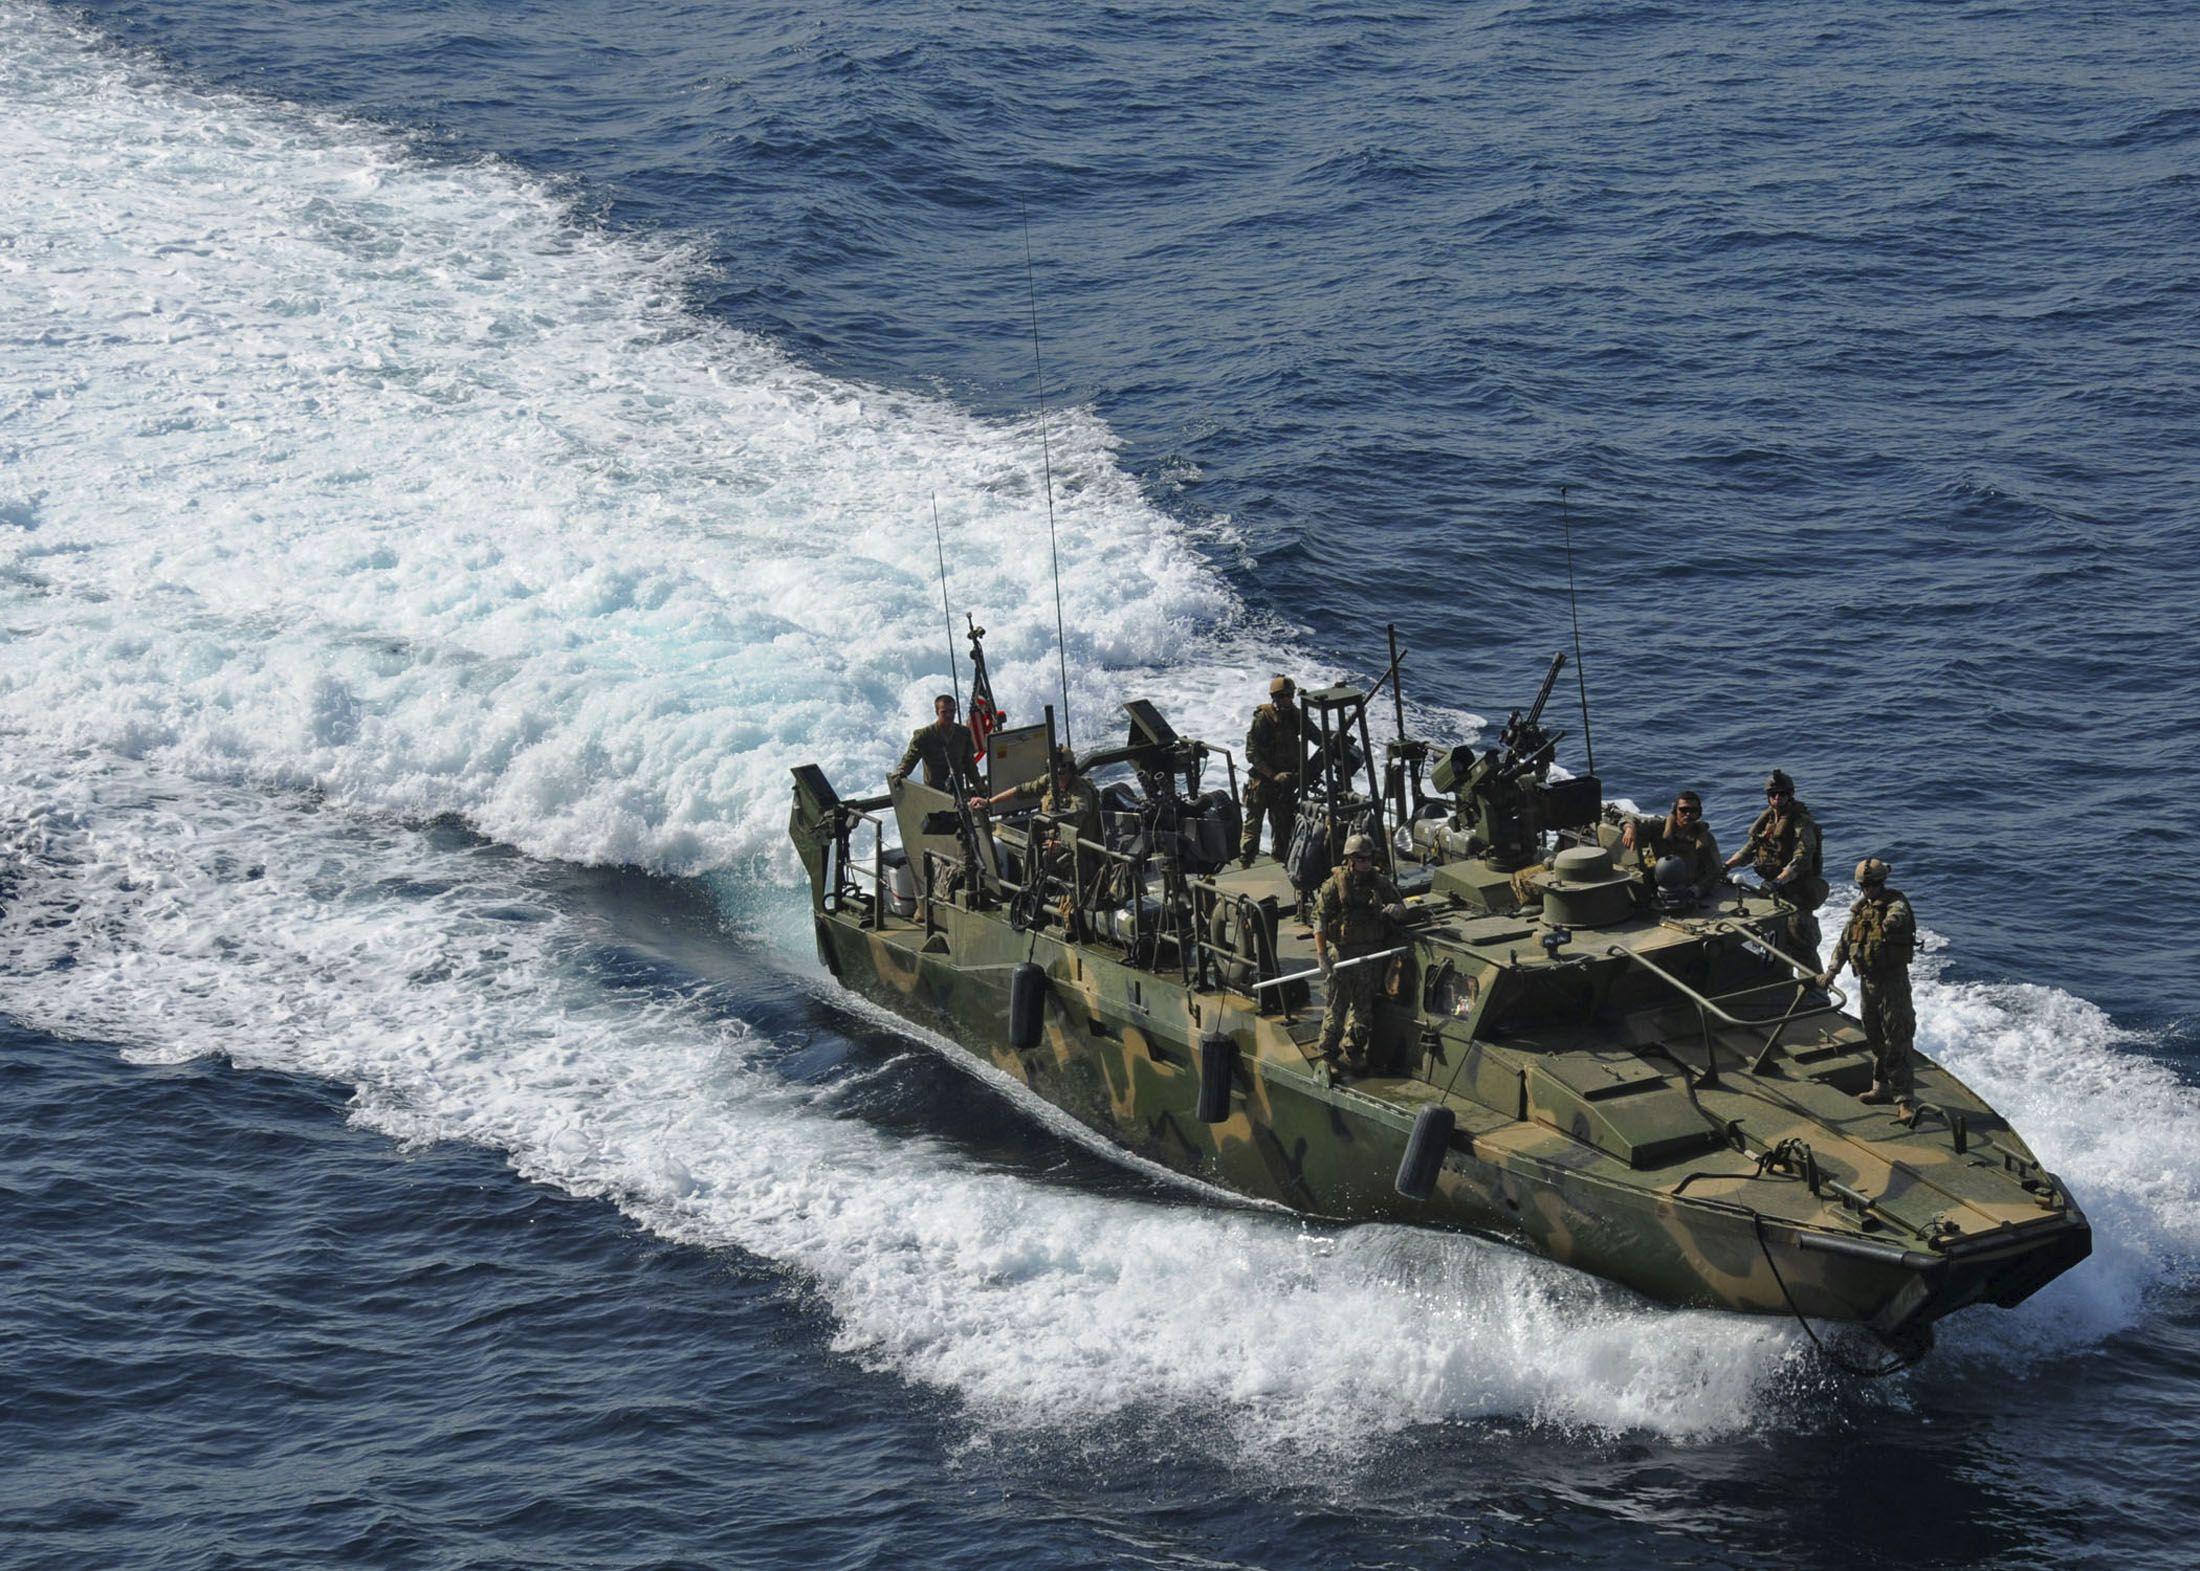 0113_Iran_Sailors_MiddleEast_01